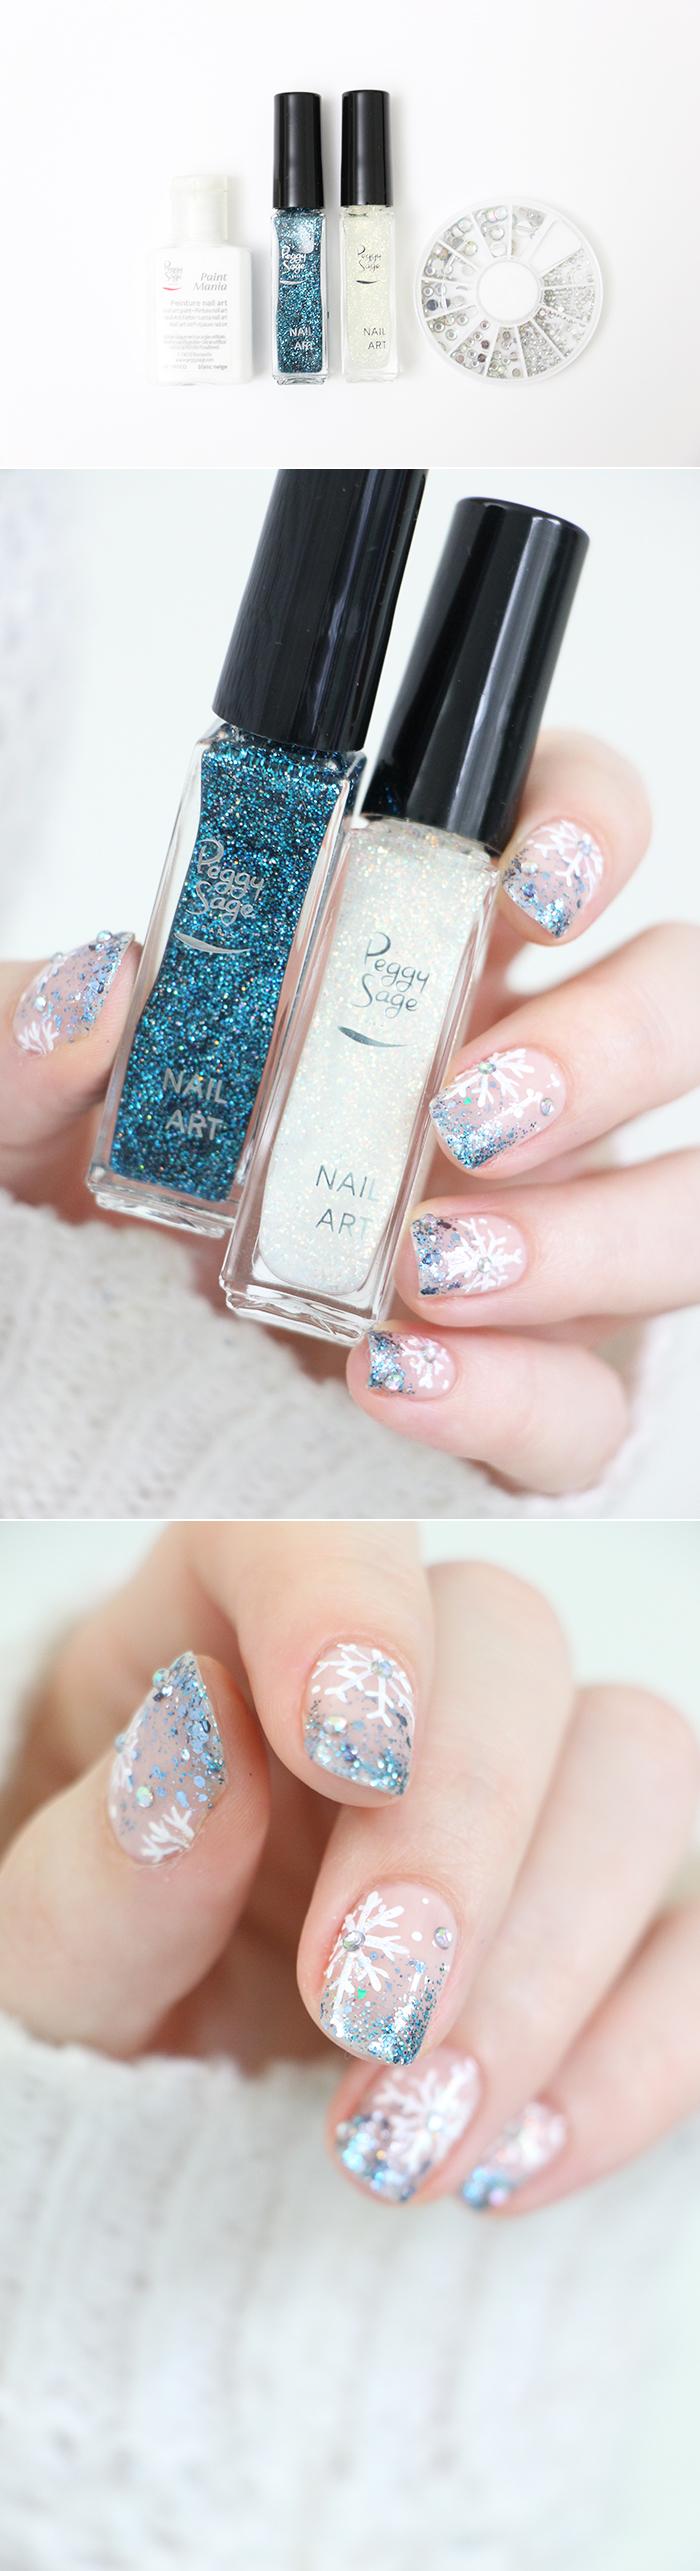 nail-art-flocons-snowflakes-3